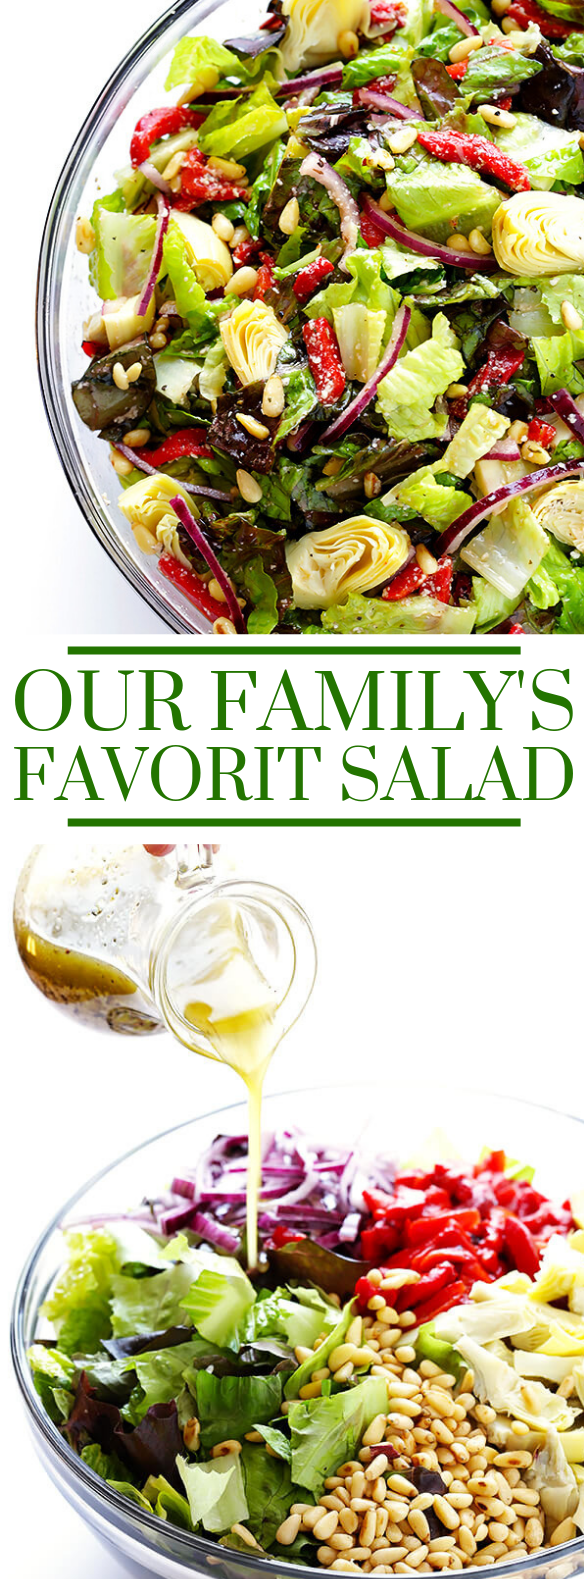 OUR FAMILY'S FAVORITE SALAD #easysalad #vegetarian